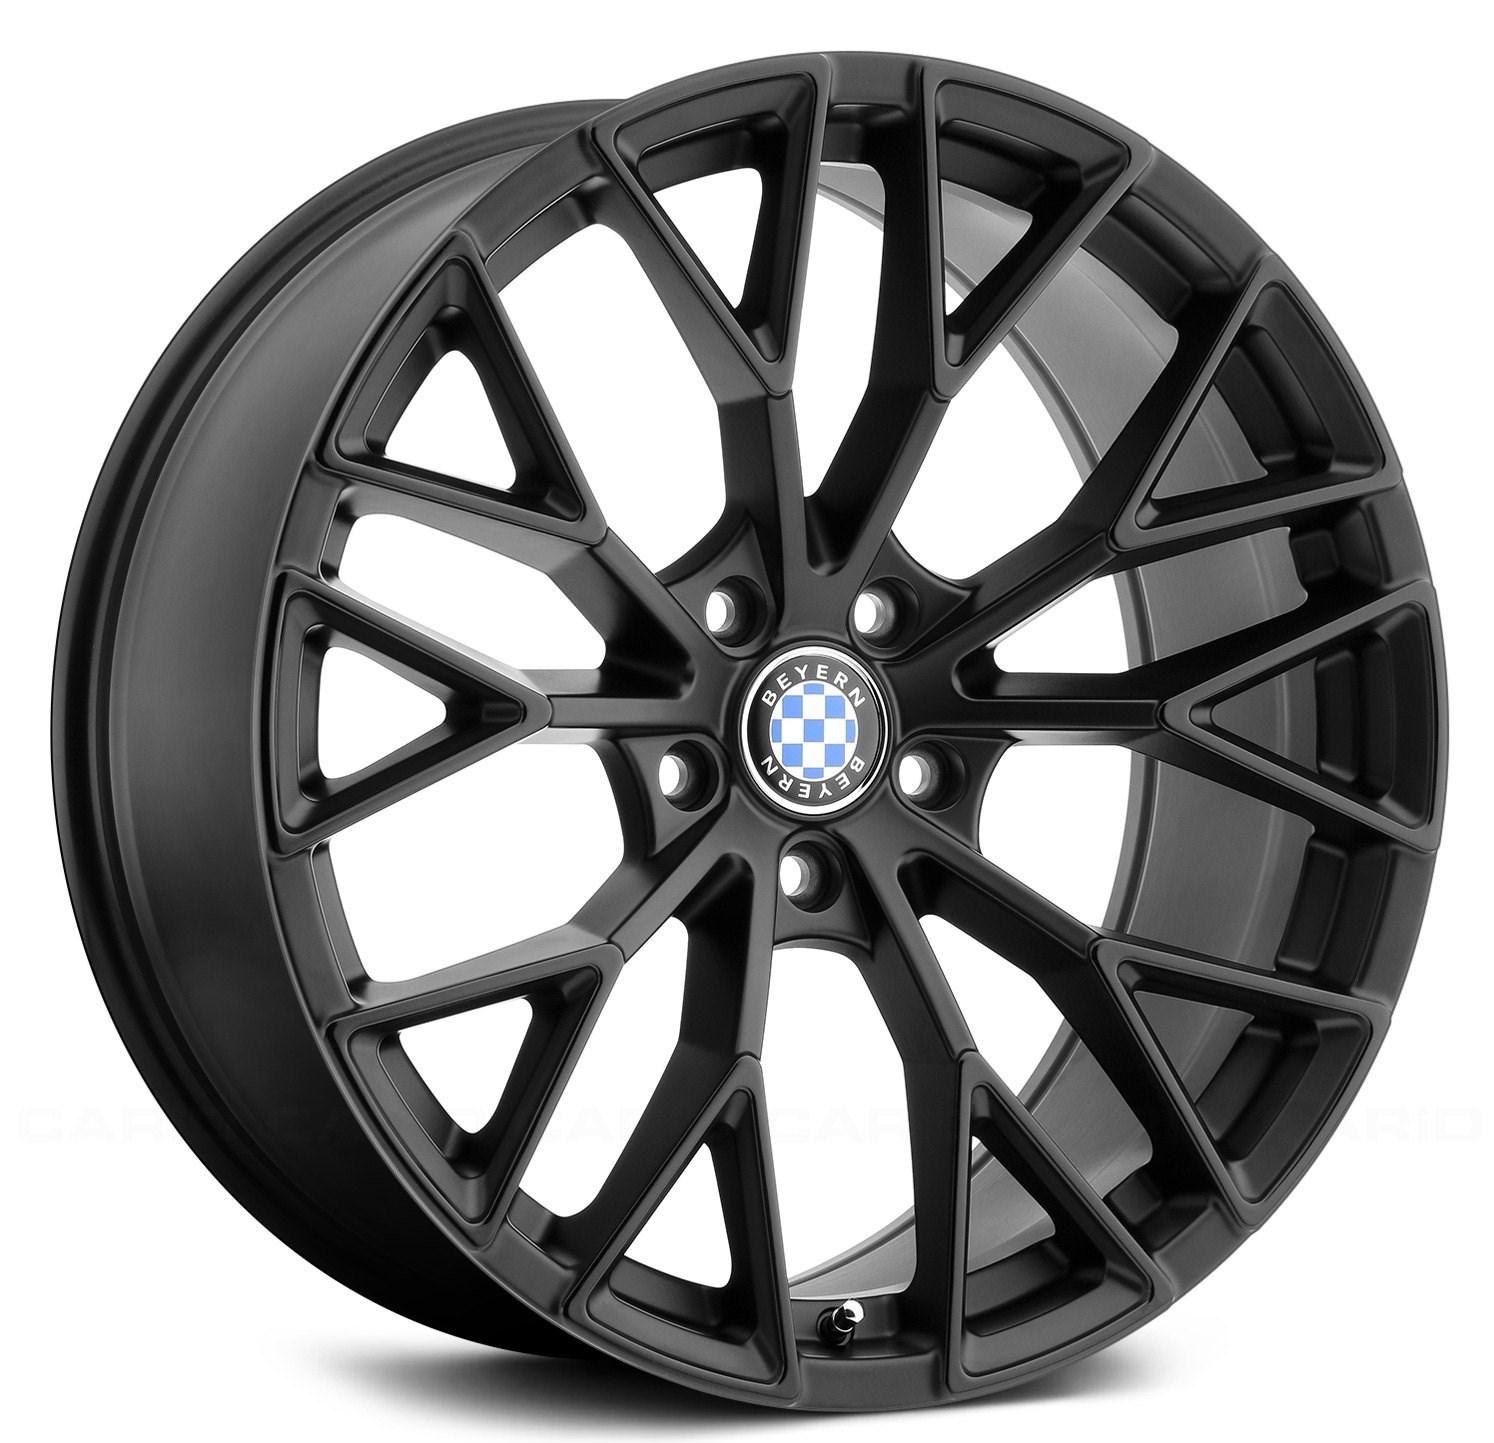 Bmw Z4 Custom Wheels: Beyern Felger